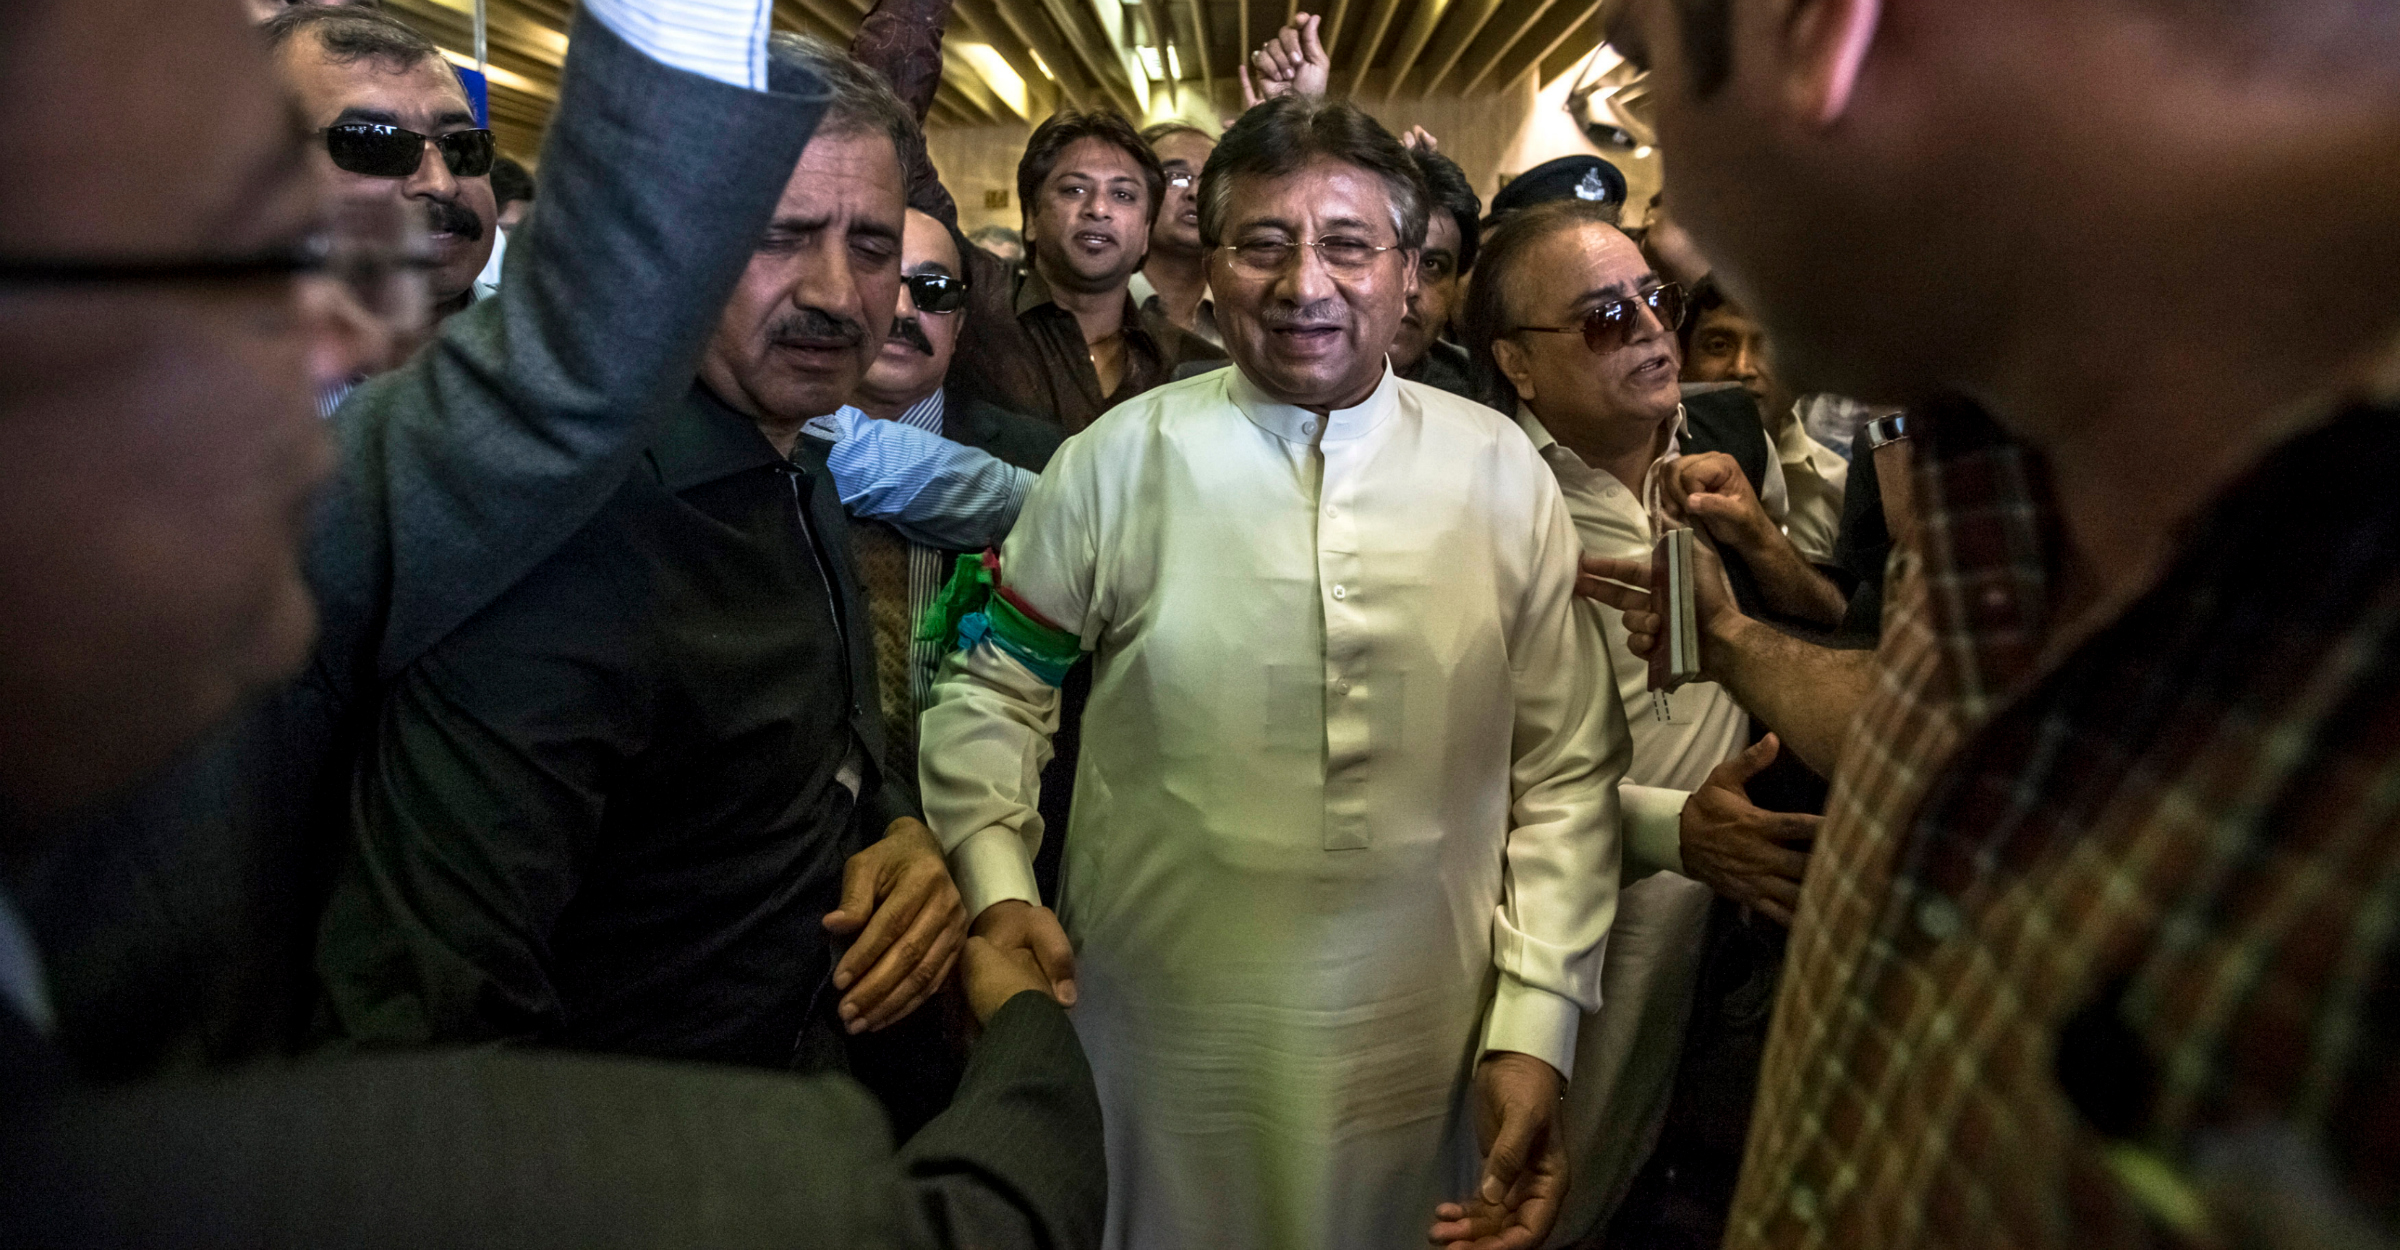 Former Pakistani president, Pervez Musharraf